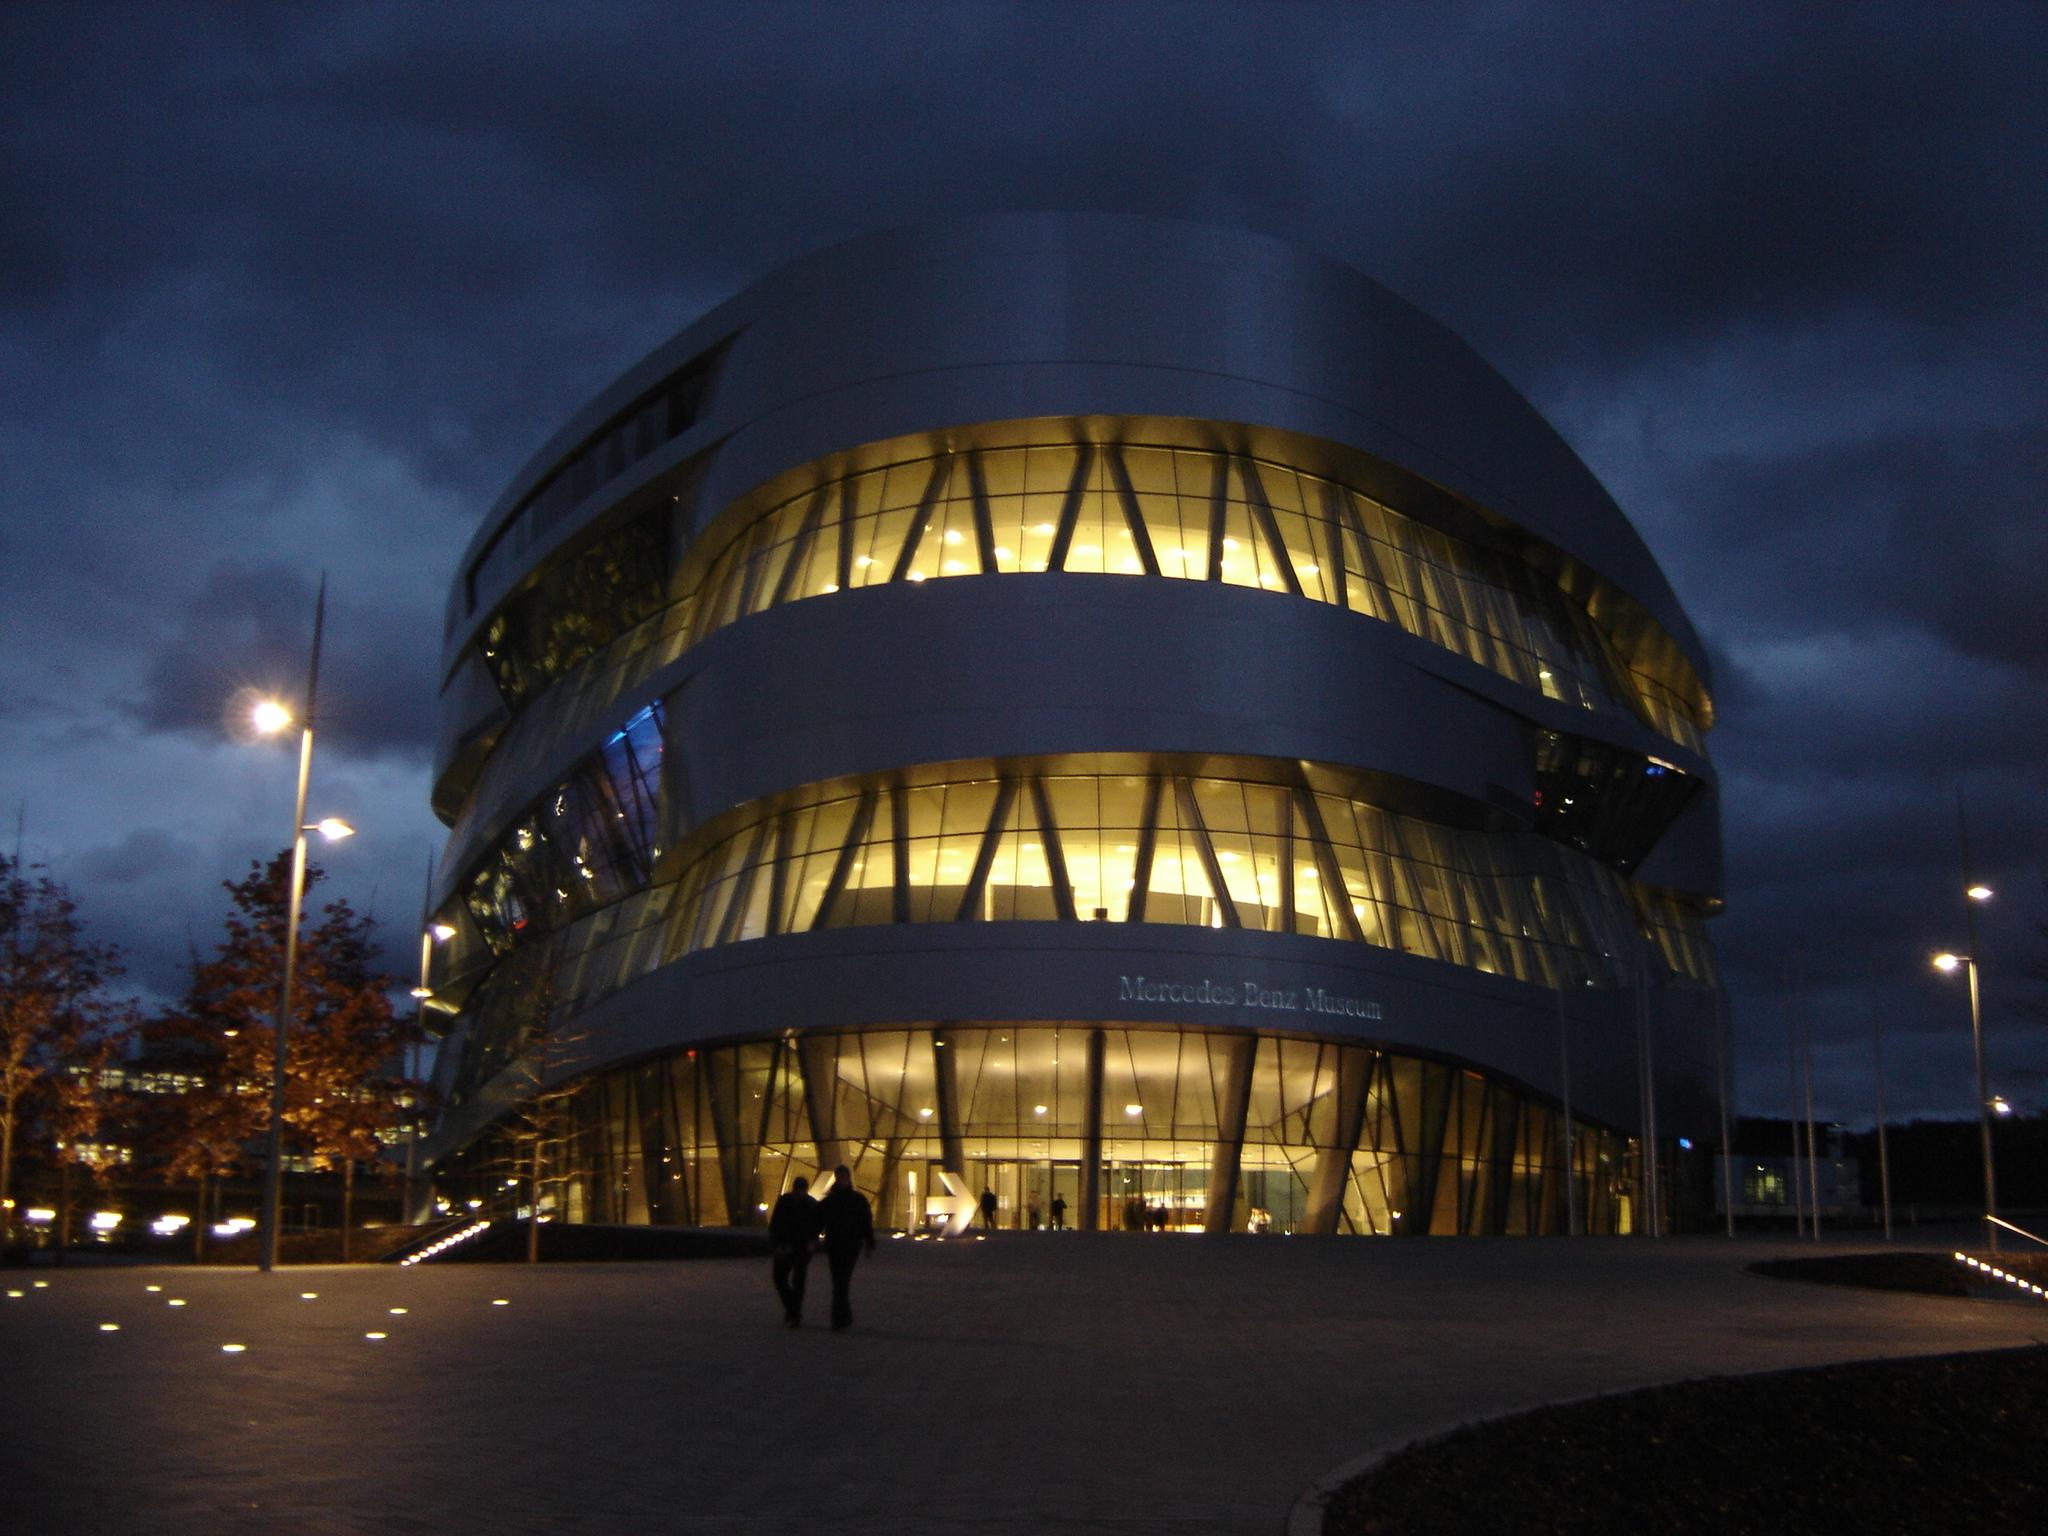 UN ARGENTINO EN EL MUSEO MERCEDES BENZ